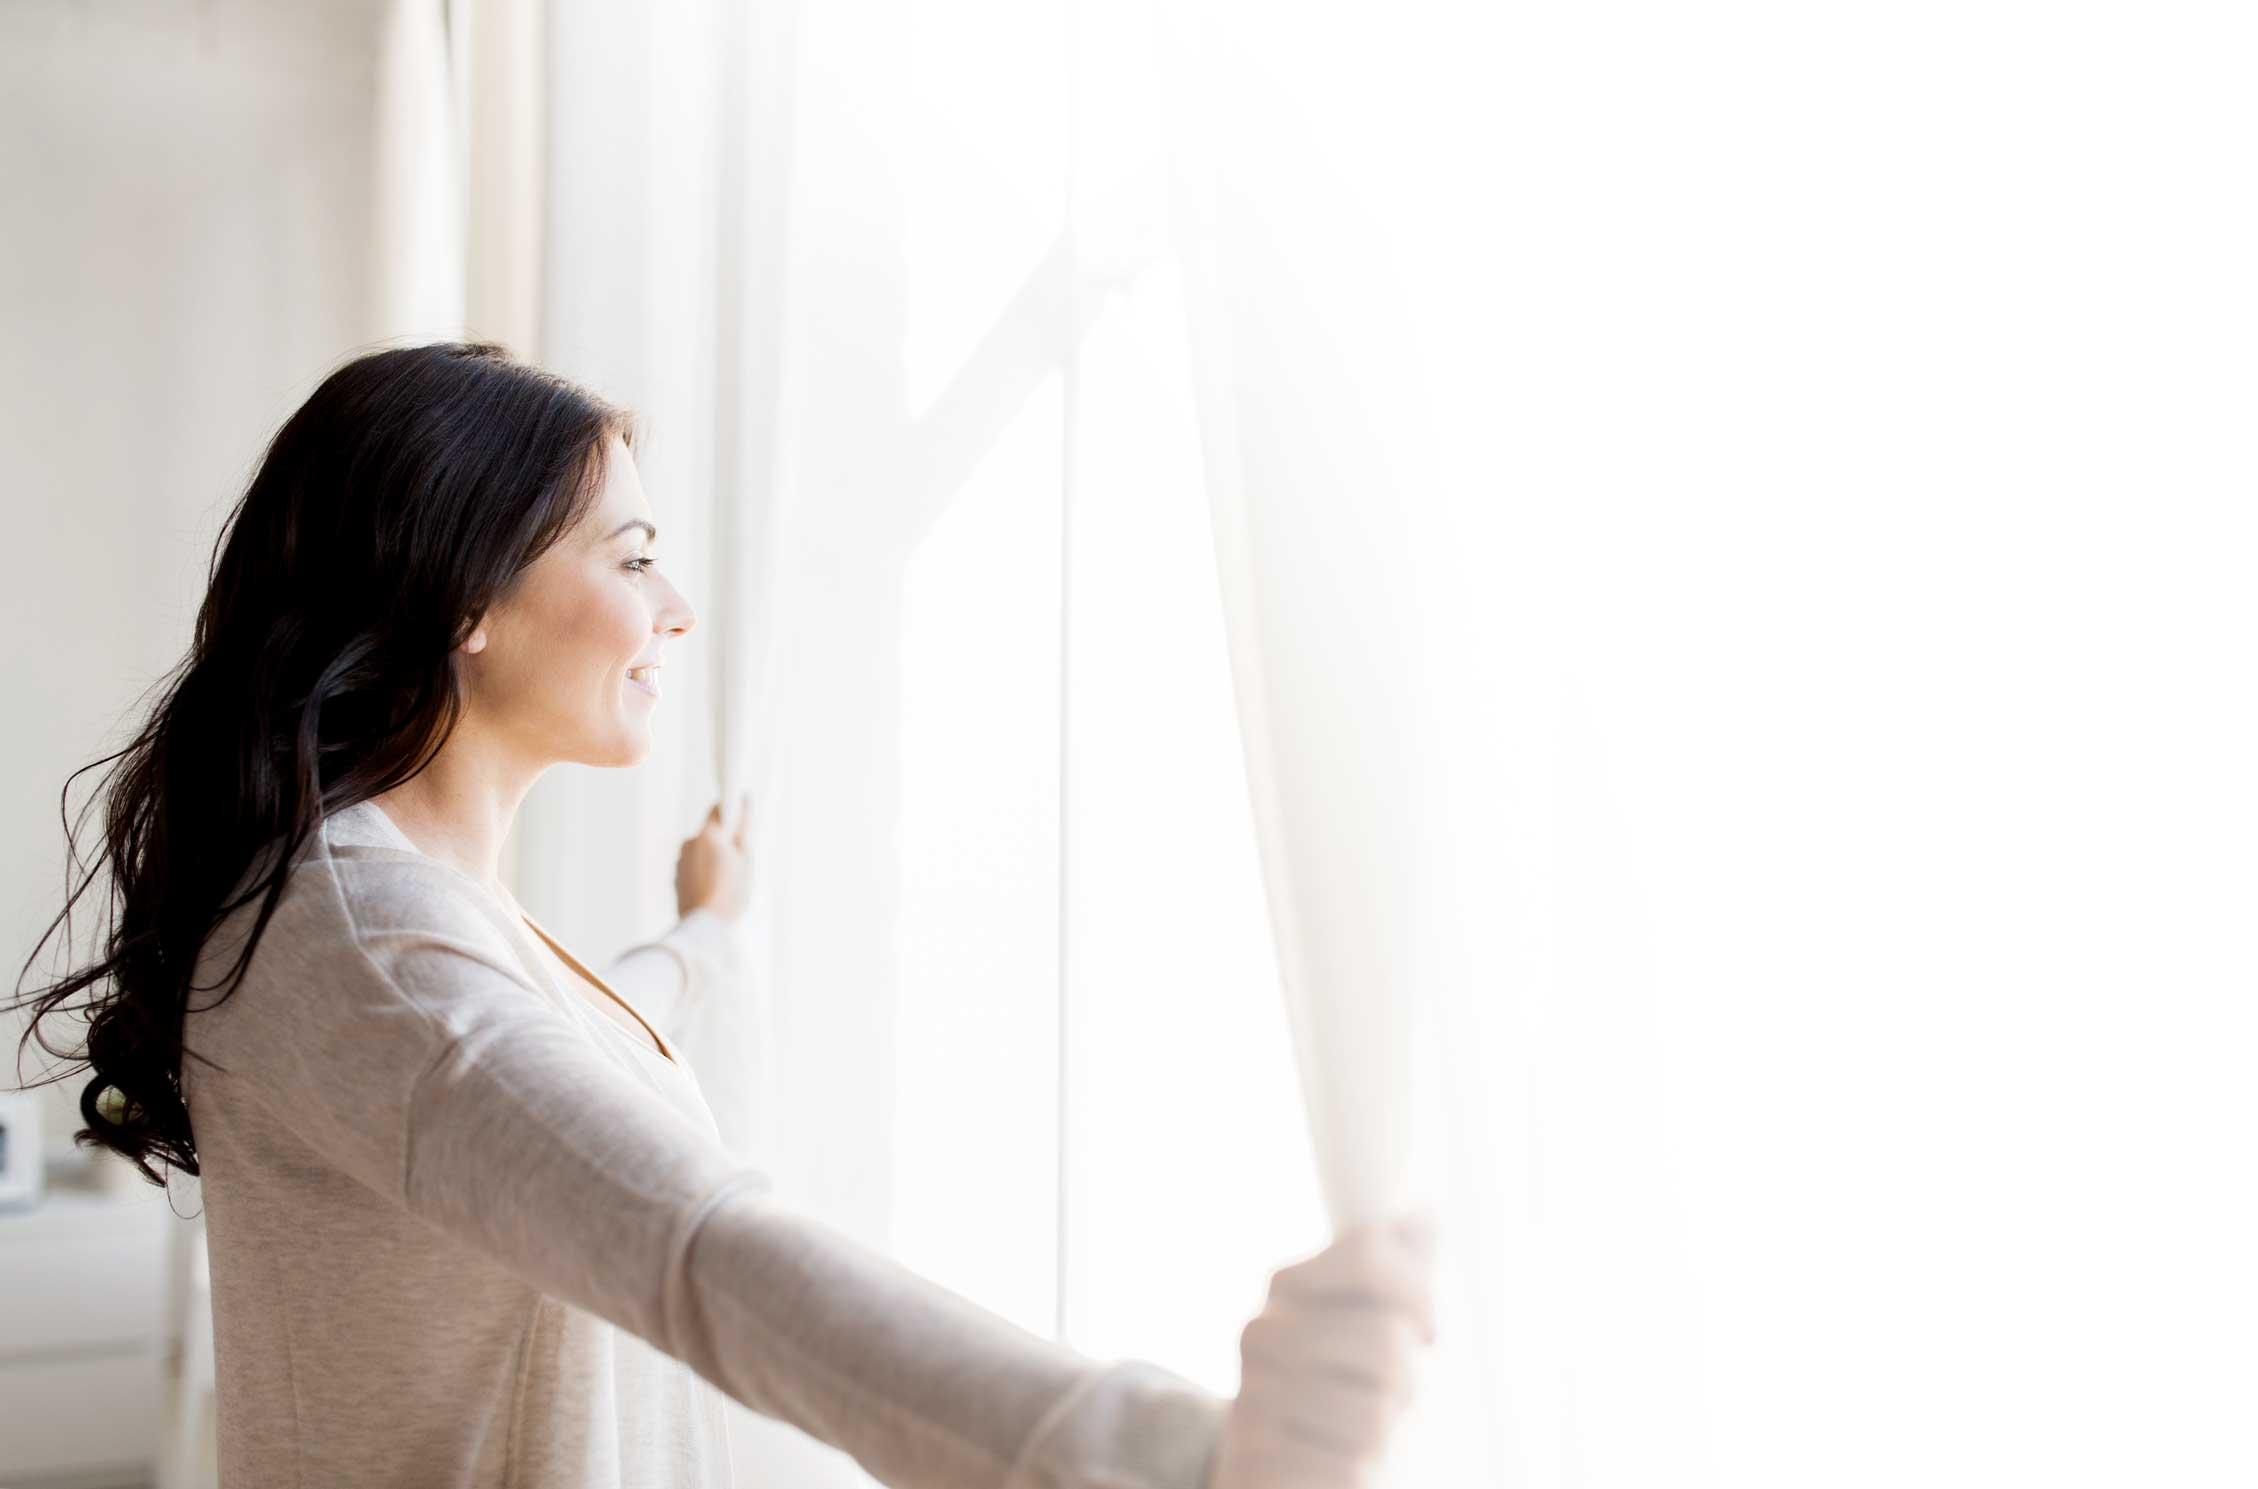 Woman smiling looking outside window